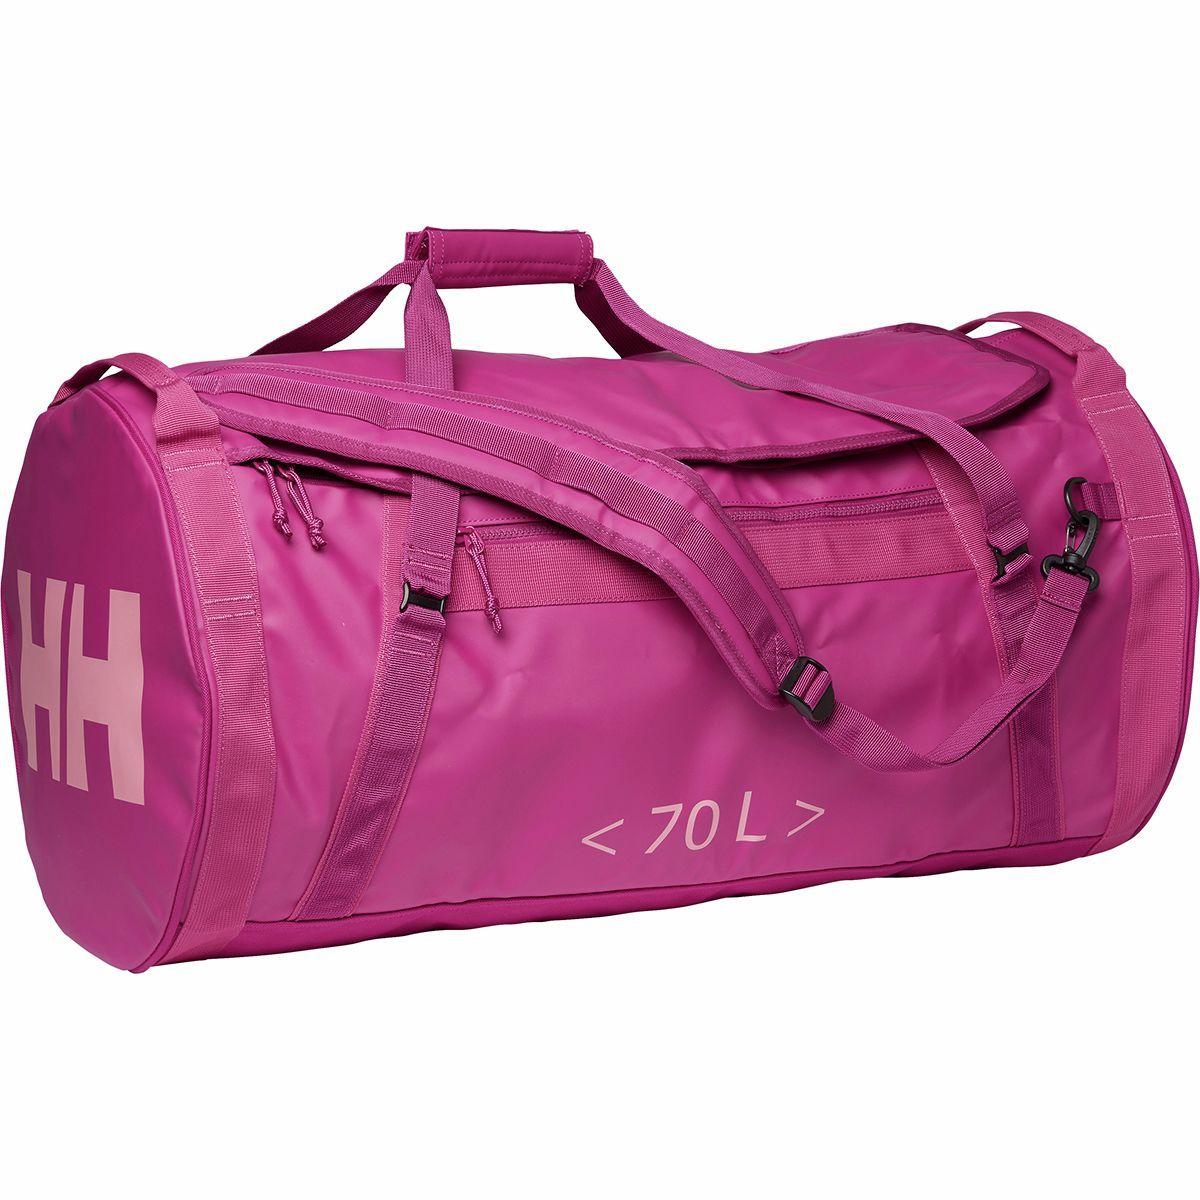 Photo of Helly Hansen Duffel Bag 2 70L